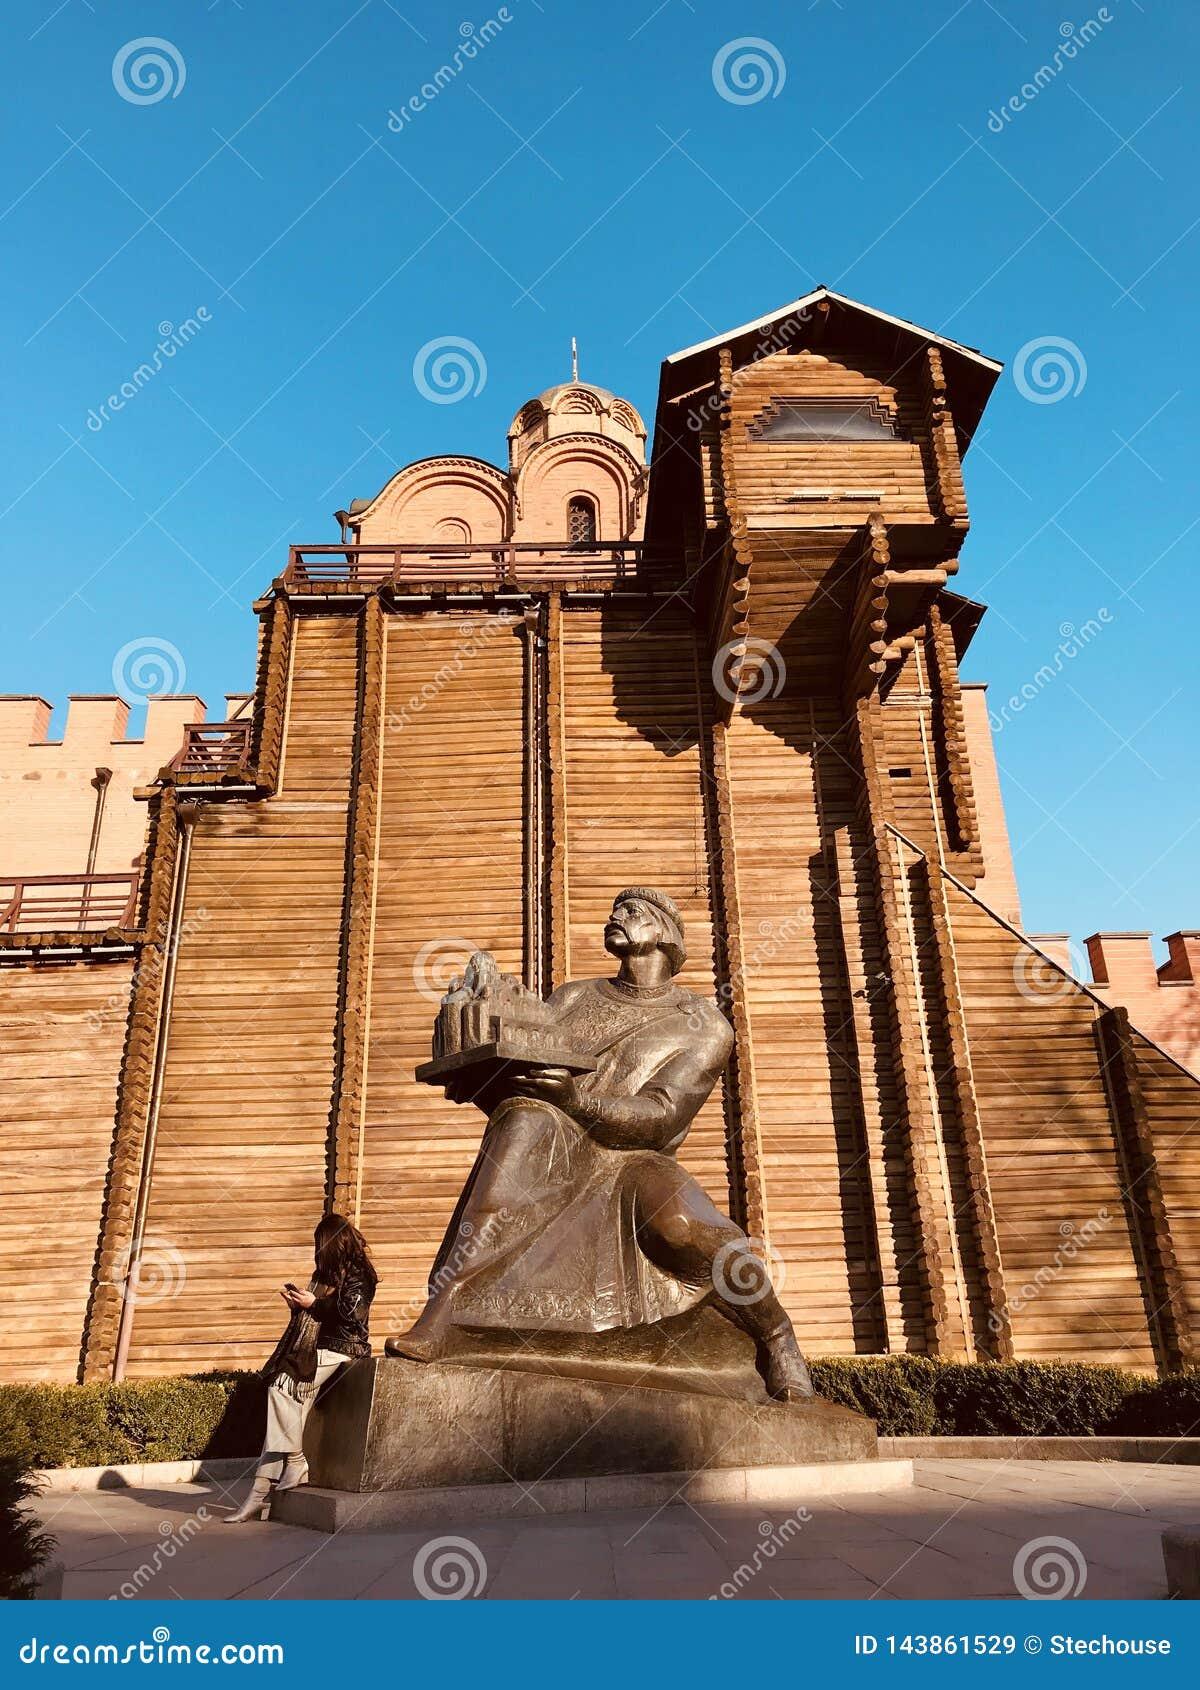 A monument to the Founding of Kyiv - Ukraine - KYIV or KIEV